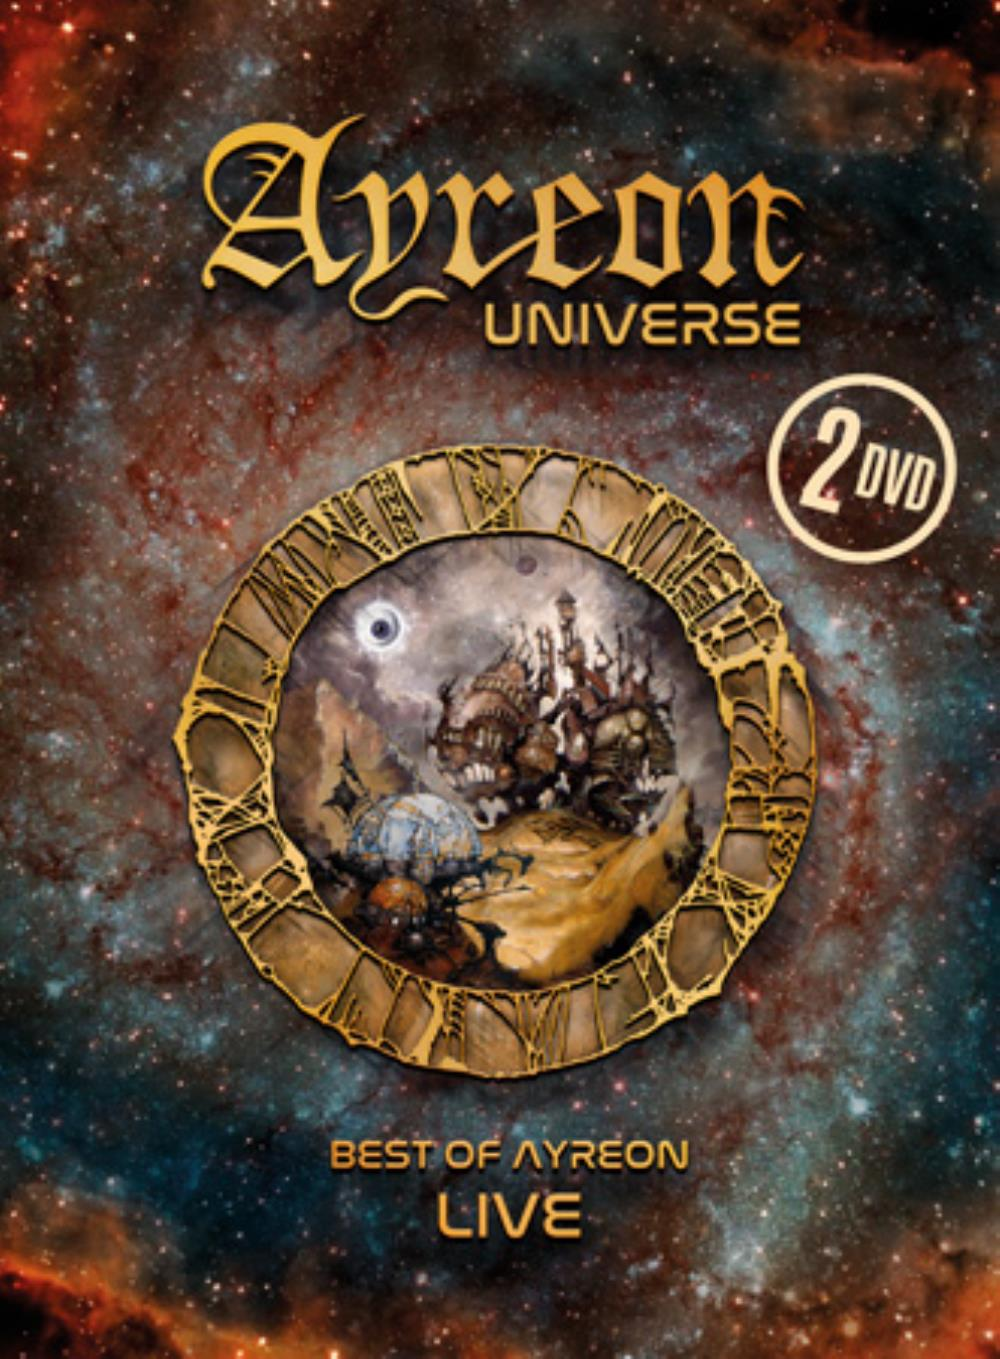 Ayreon Universe : Best of Ayreon Live by AYREON album cover